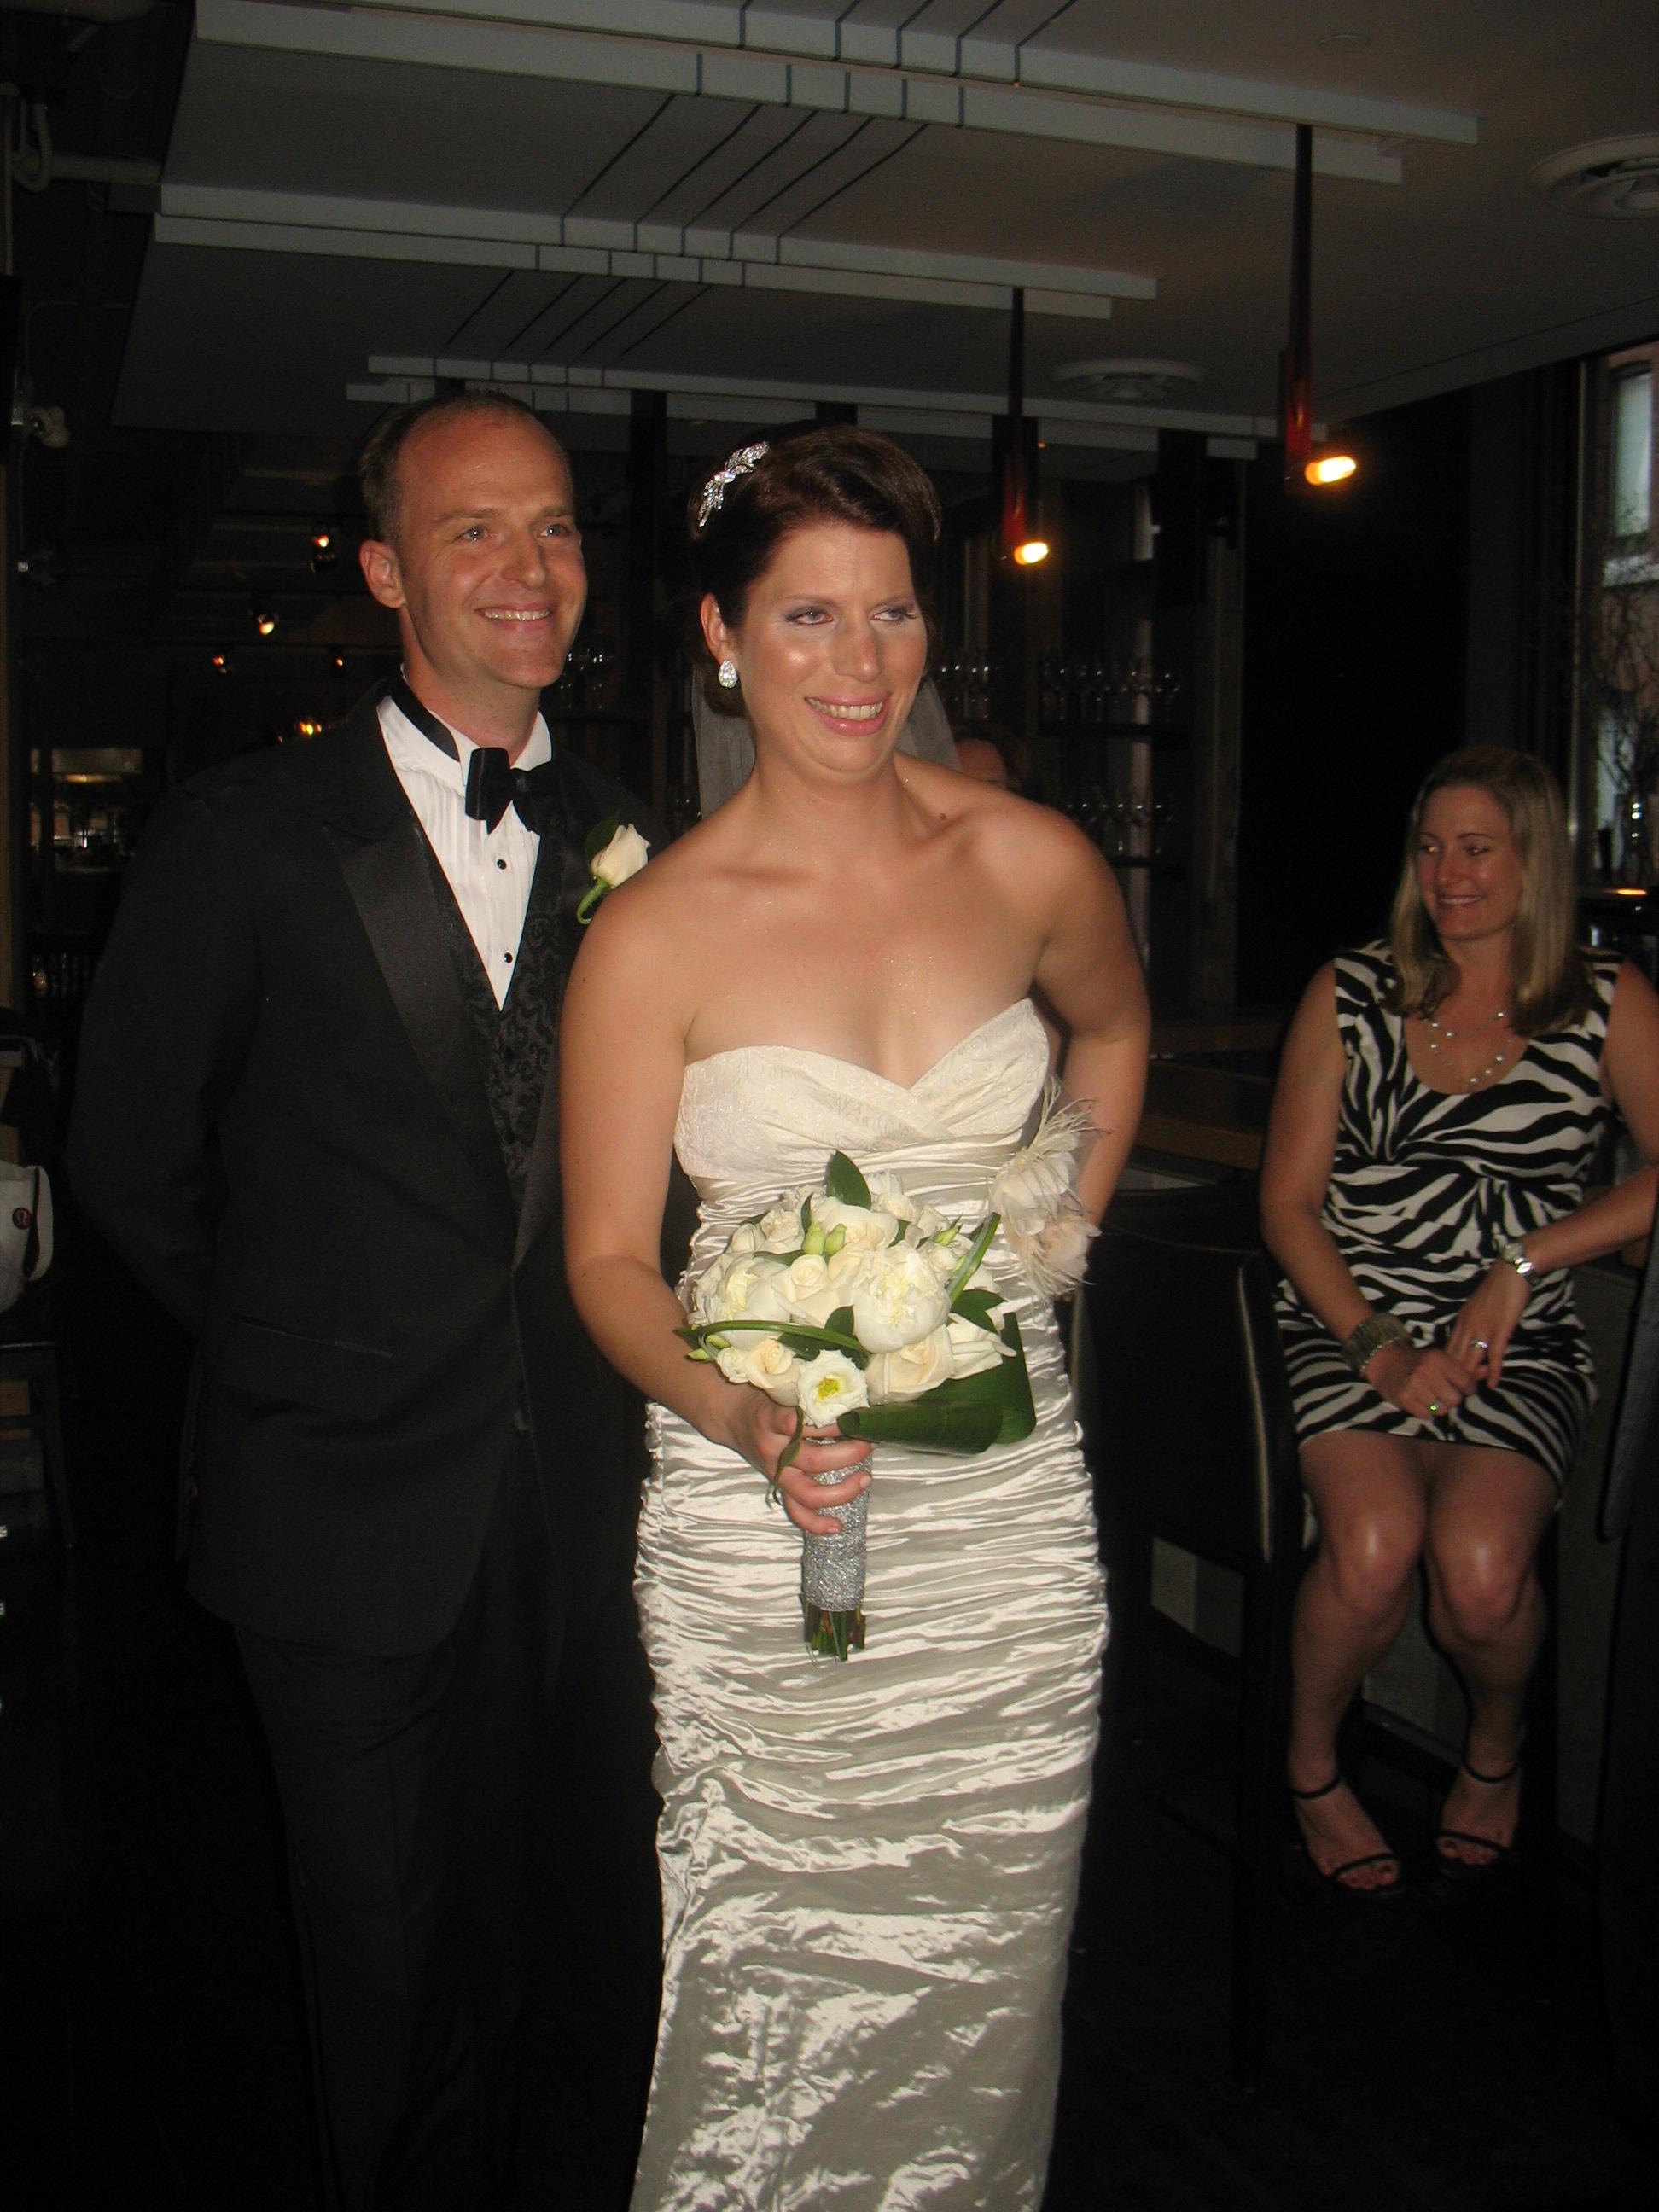 James & Abby Elson Wedding Video Highlights, June 24th, 2012